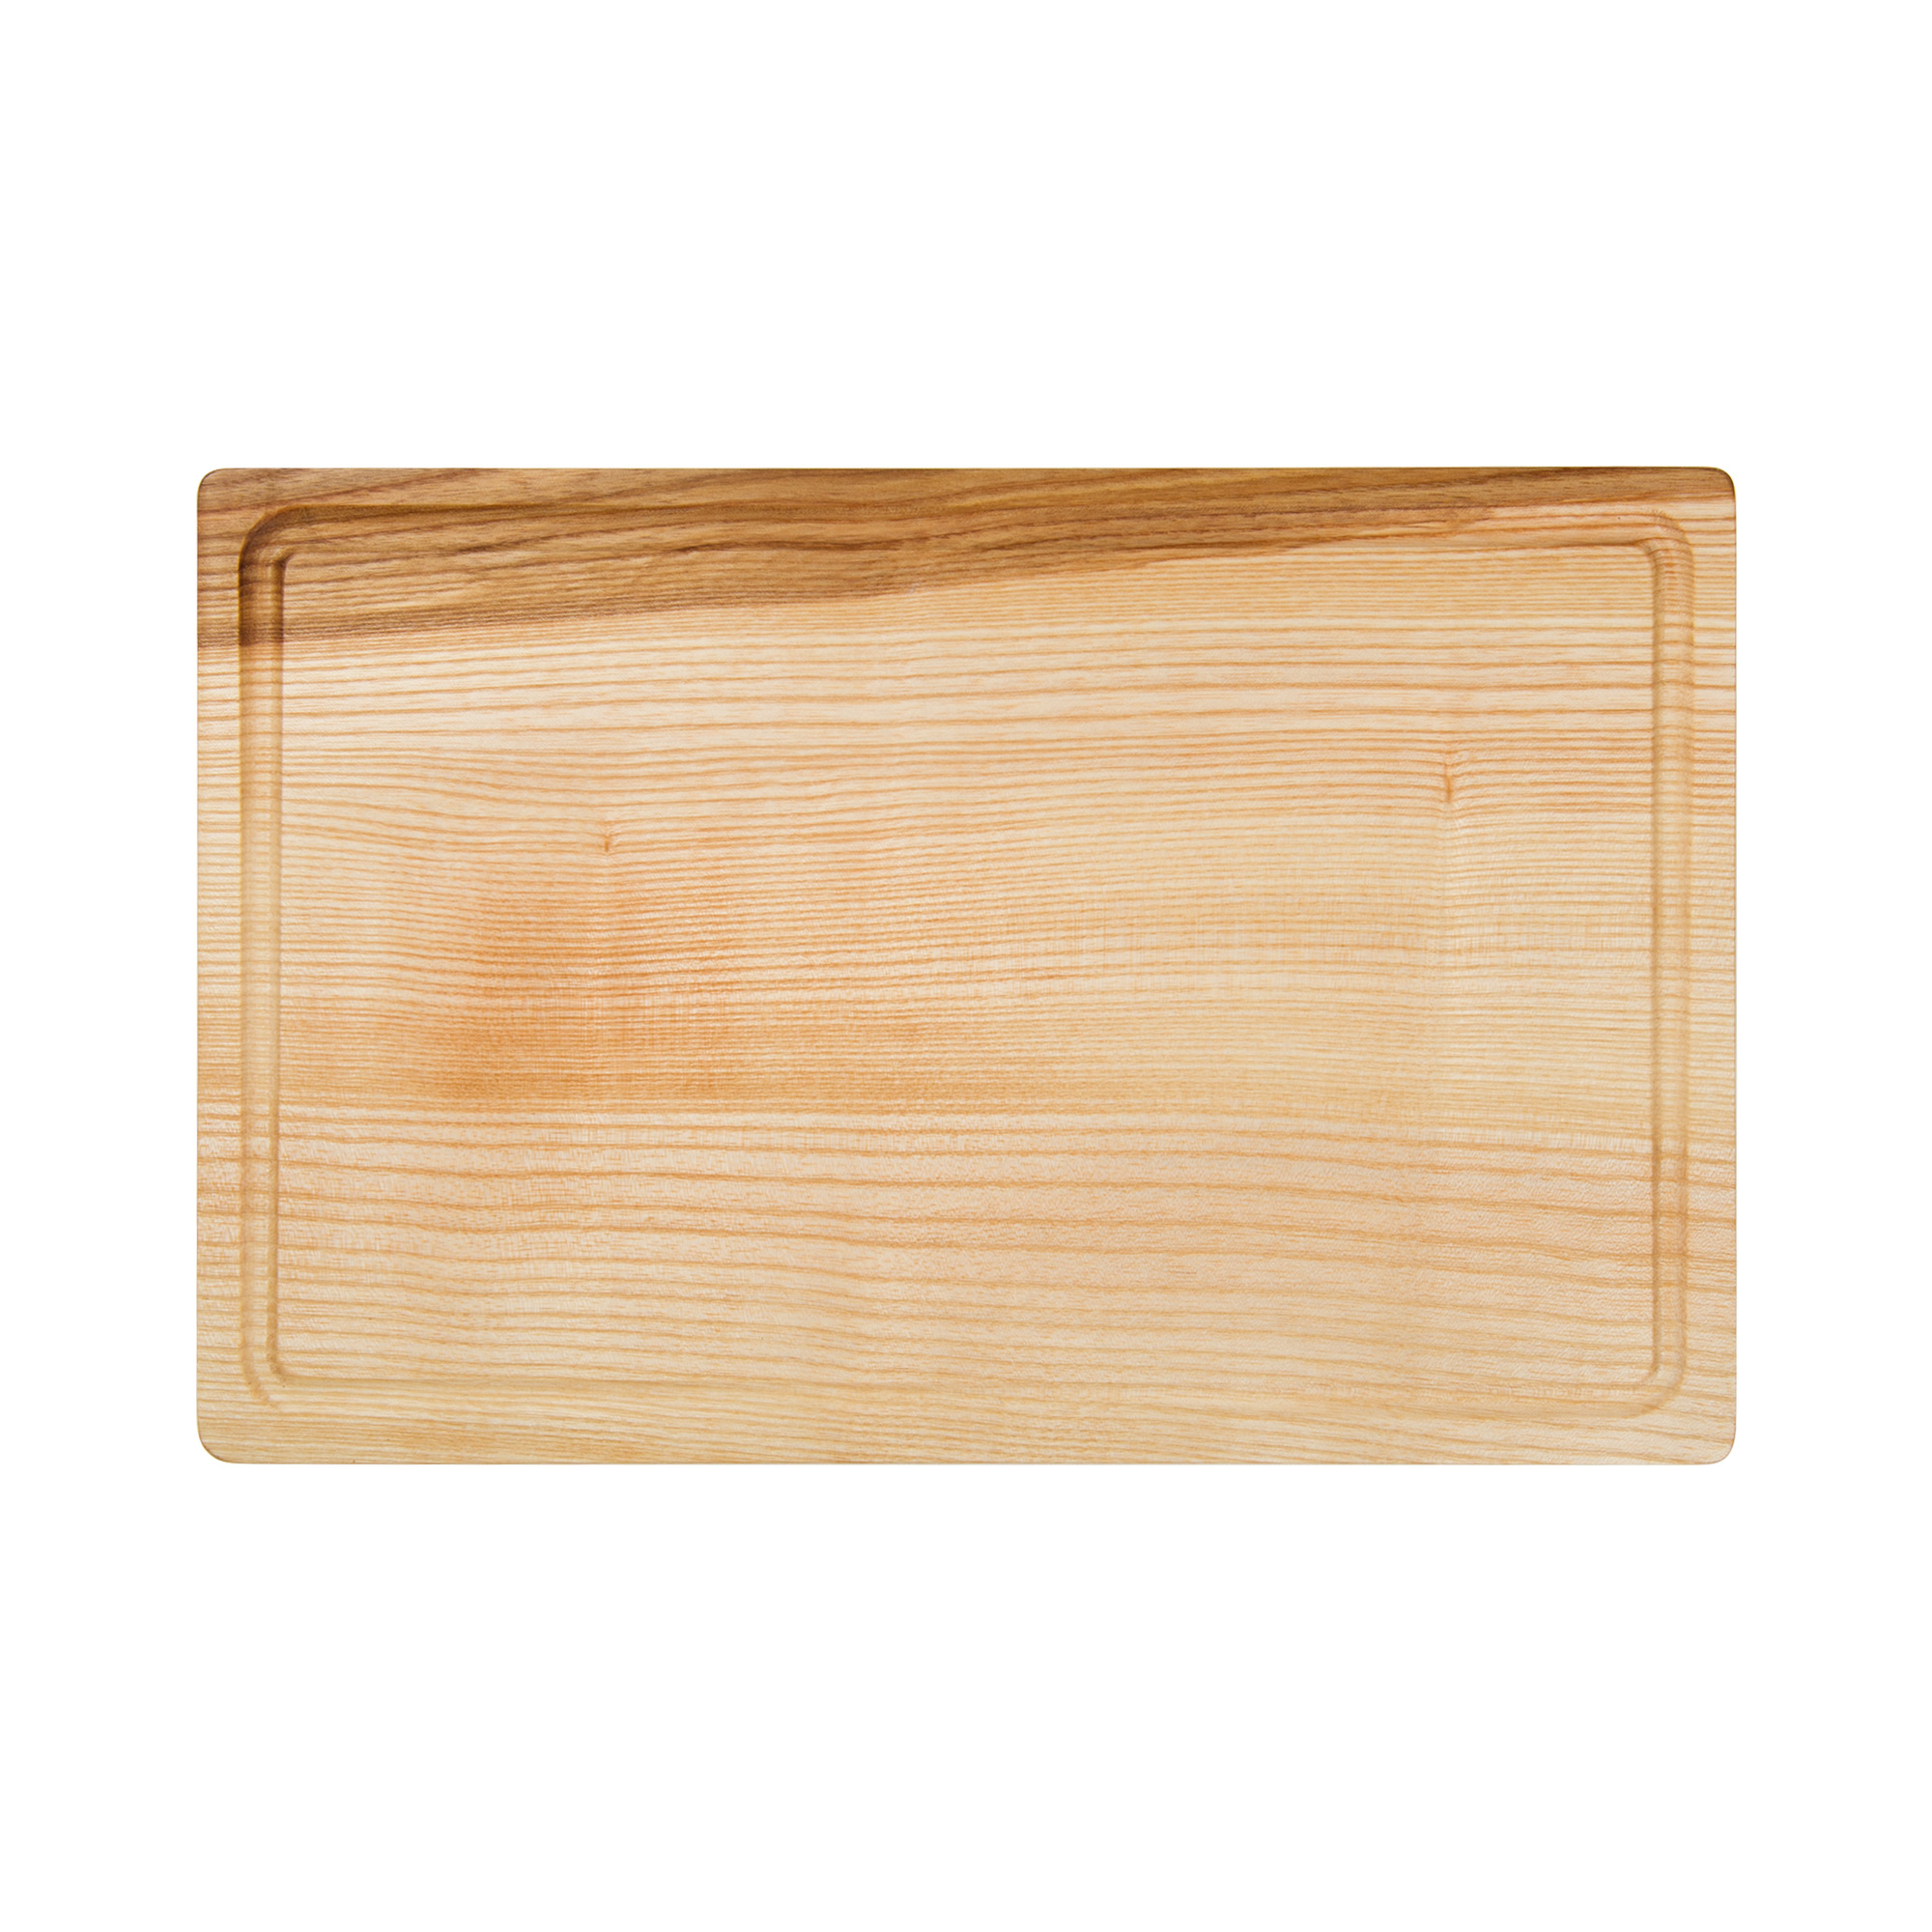 planche-a-decouper-bois-massif-DSC_2413-mon-julo